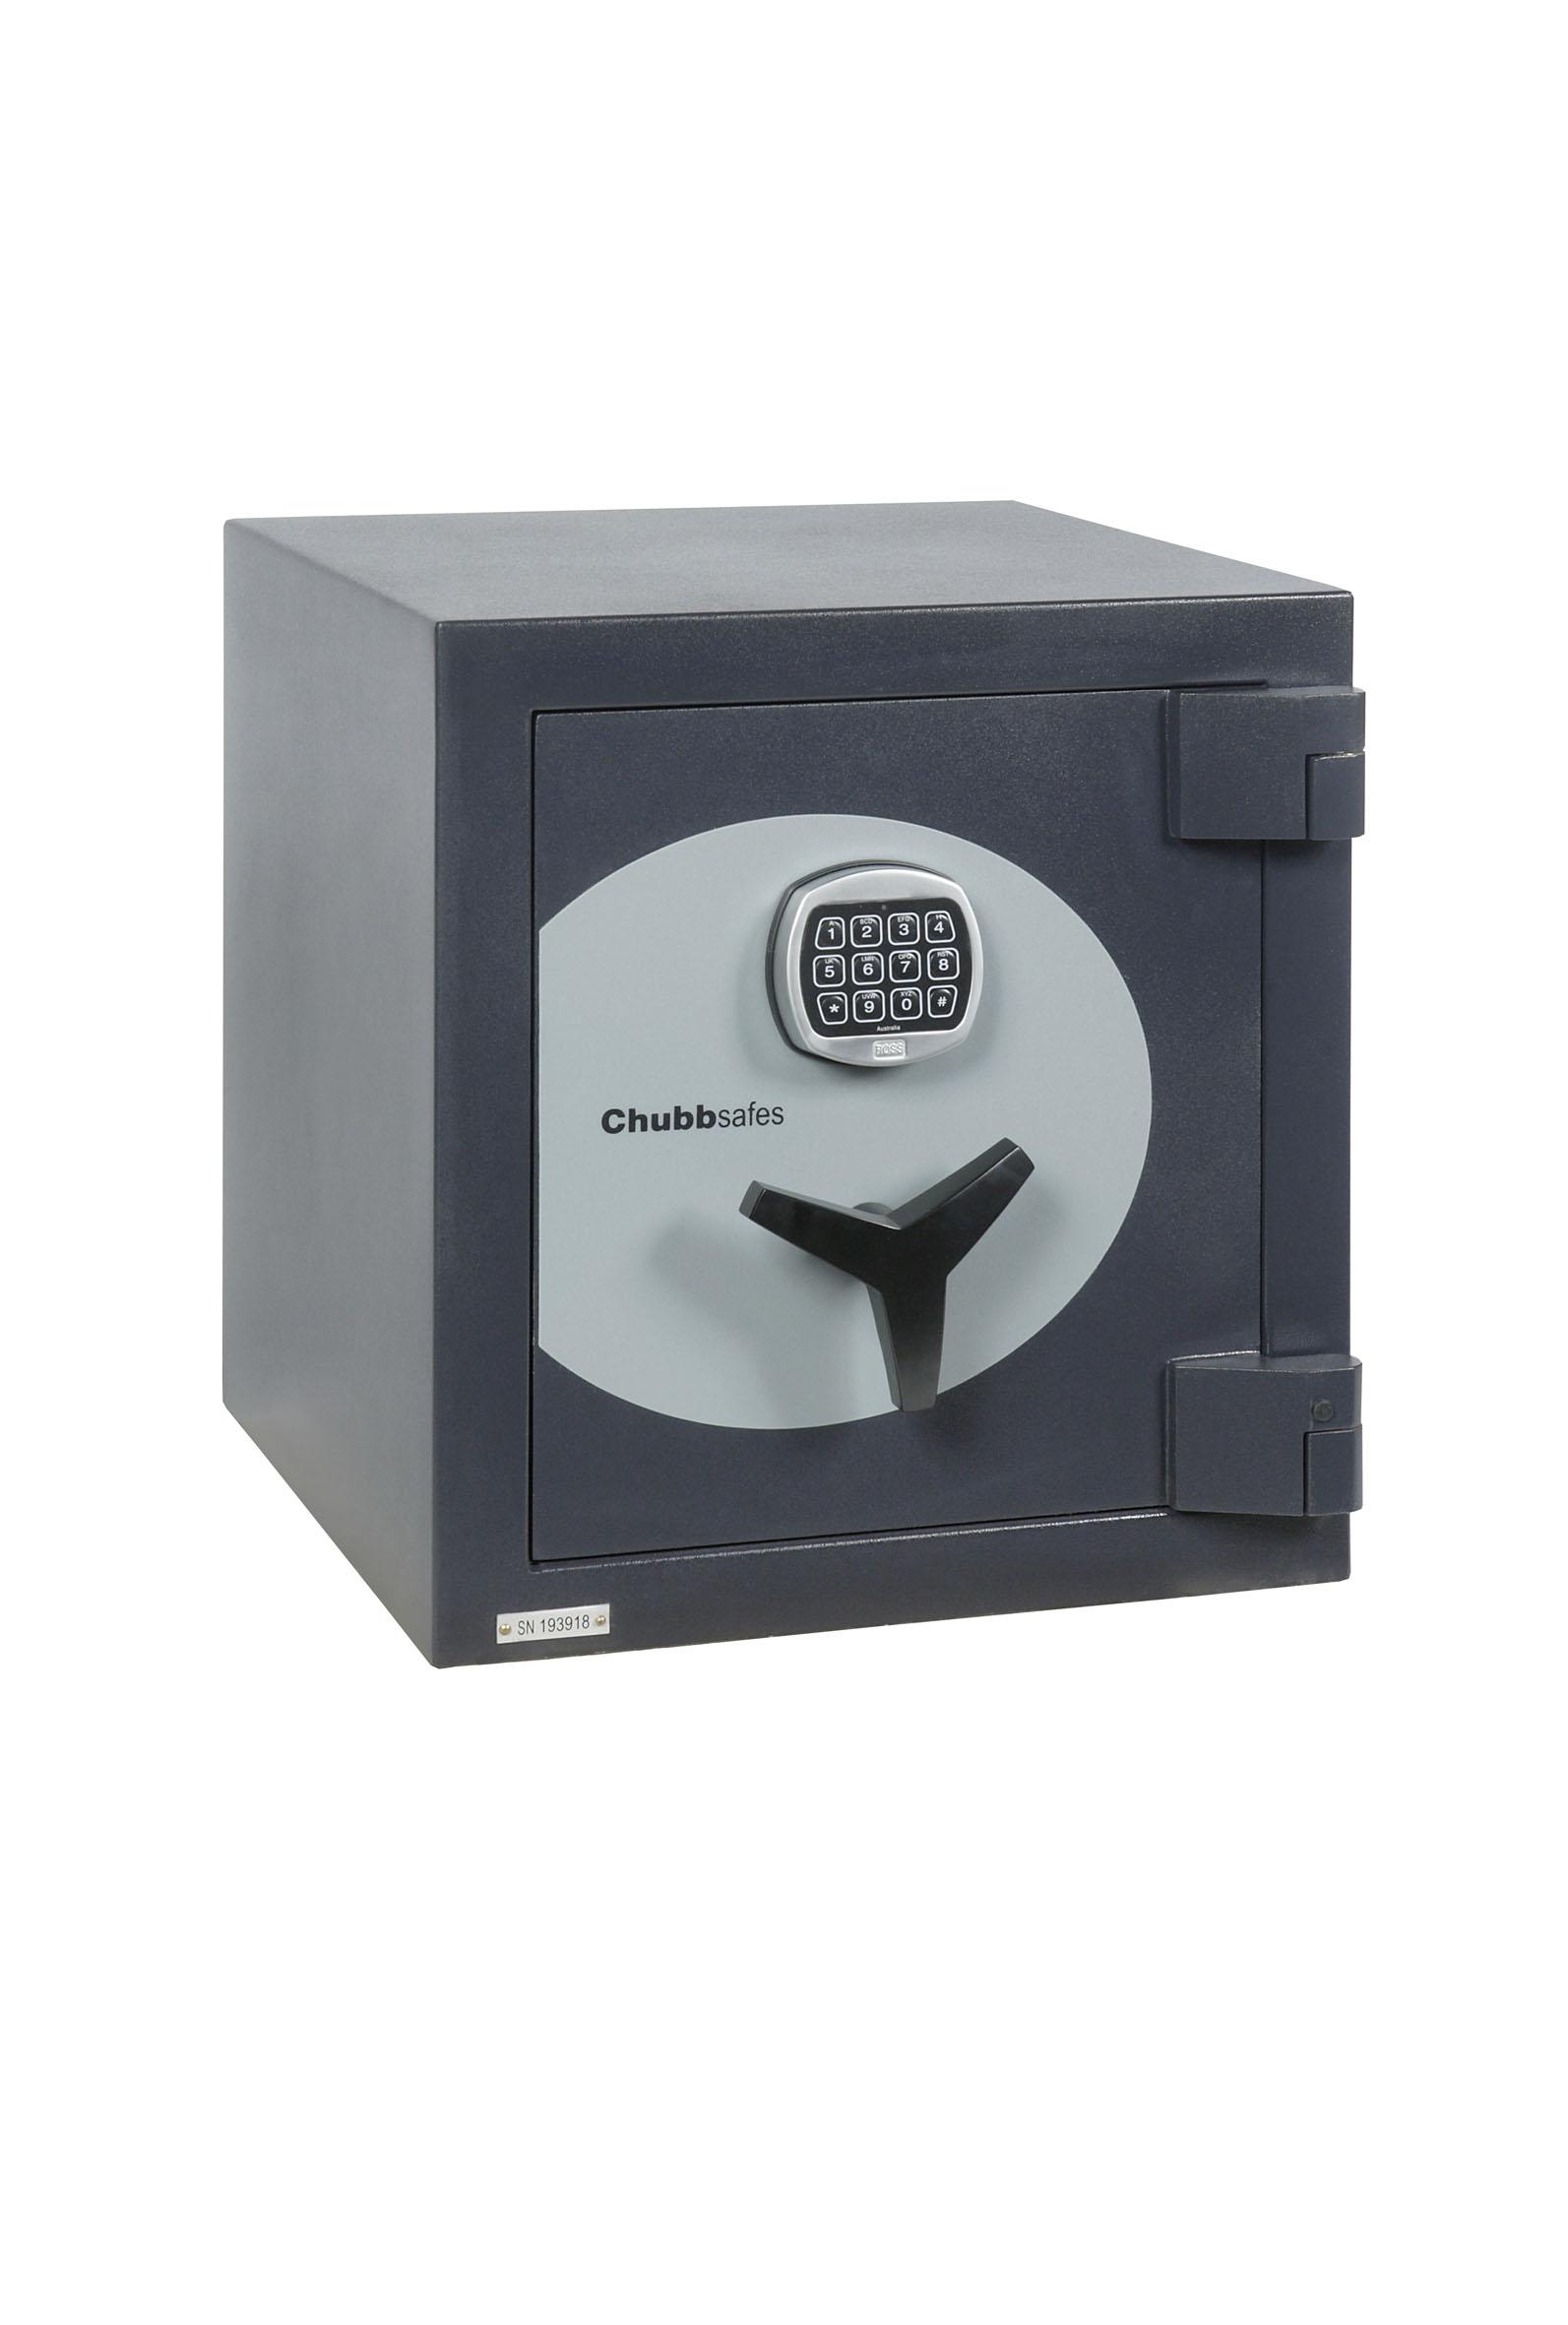 Omni Size 2 Safe by Chubb safes